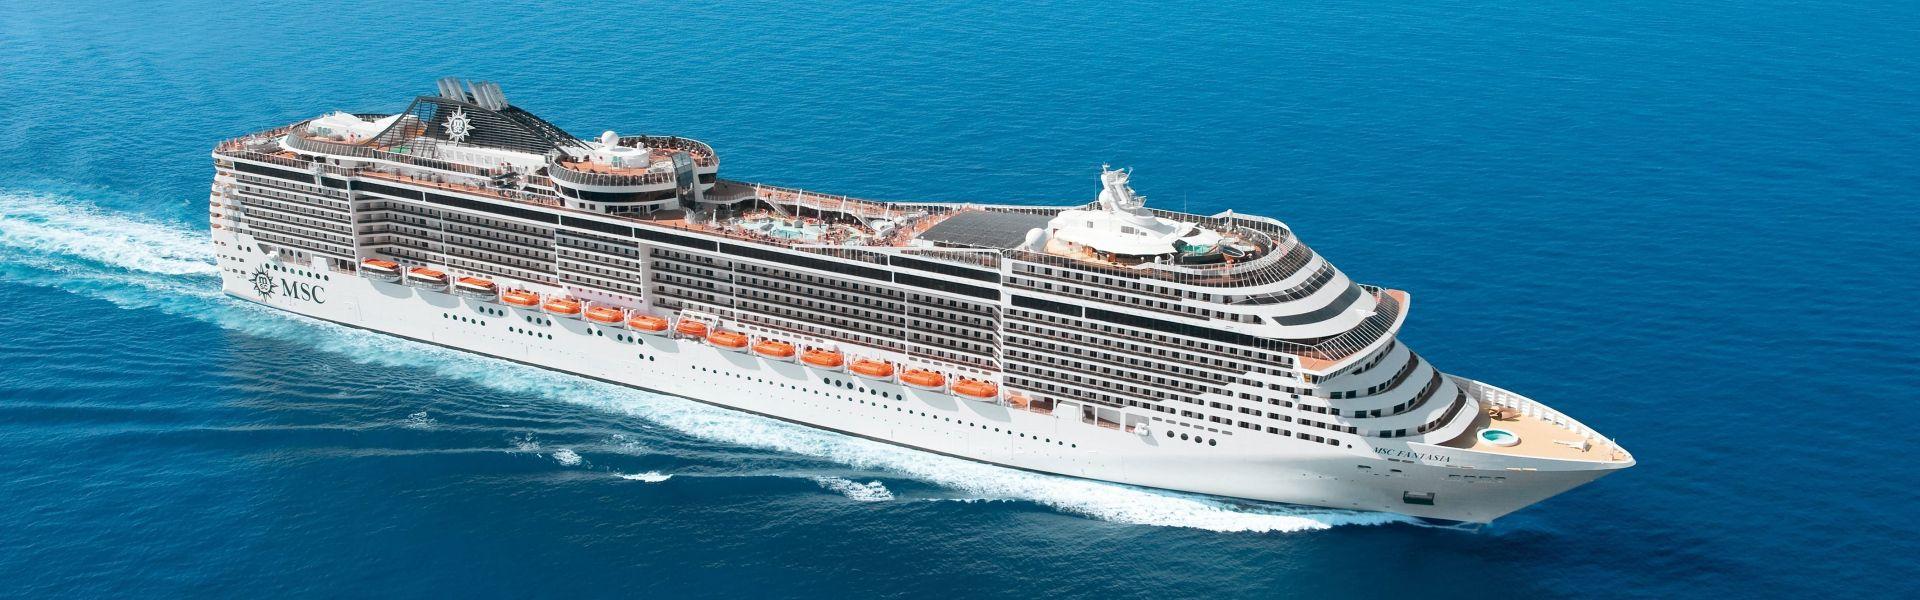 Croaziera 2018 - Mediterana de Vest (Genova) - MSC Cruises - MSC Fantasia - 7 nopti